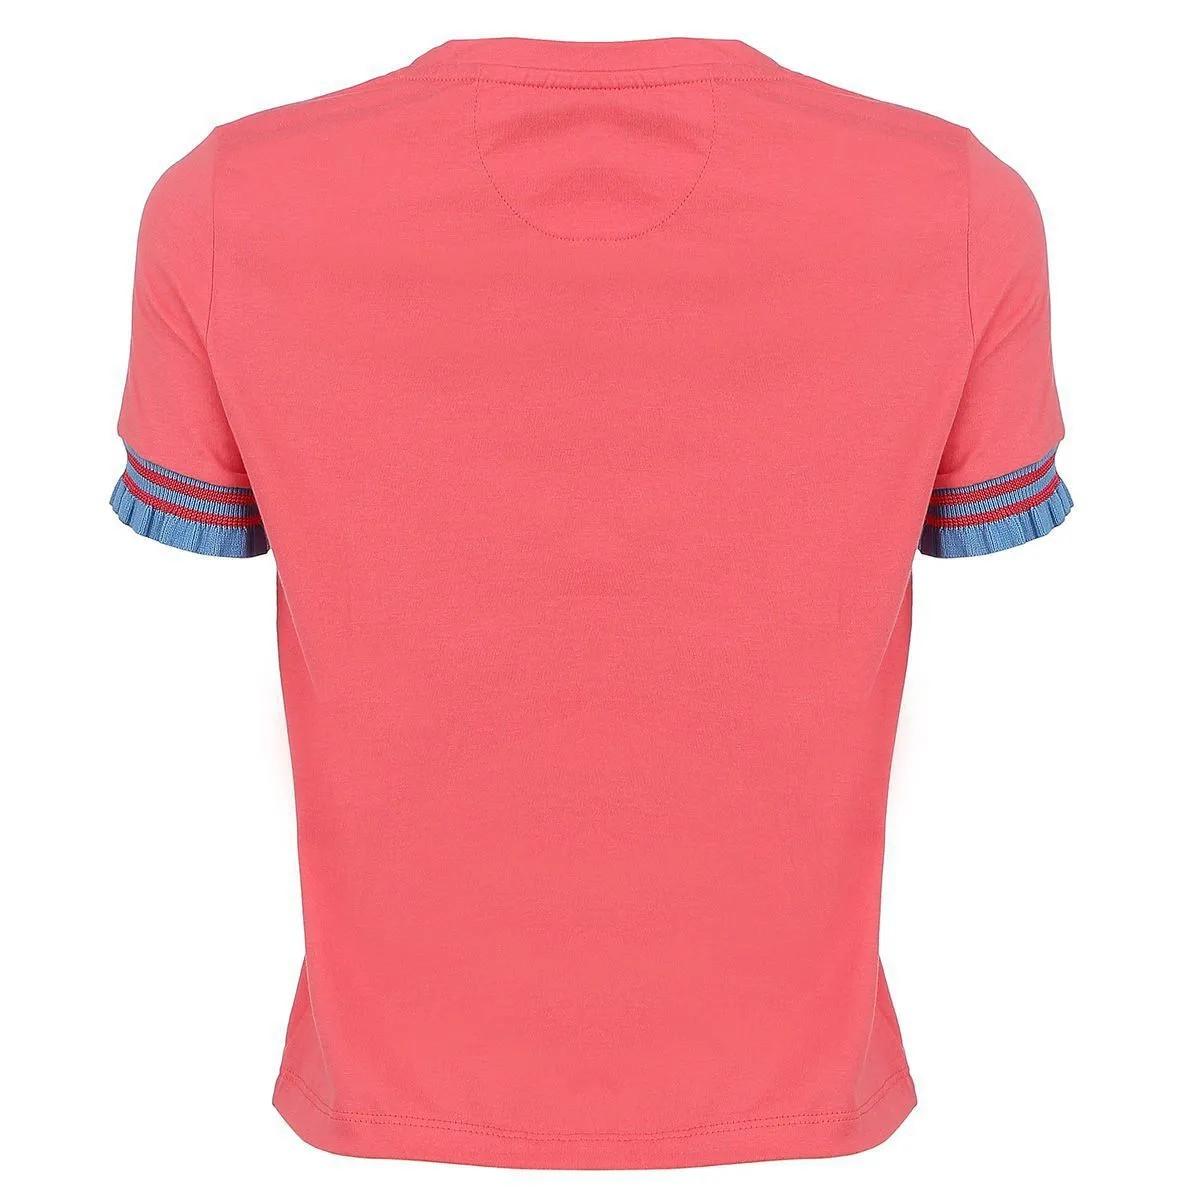 Camiseta Seeder Feminina Rosa